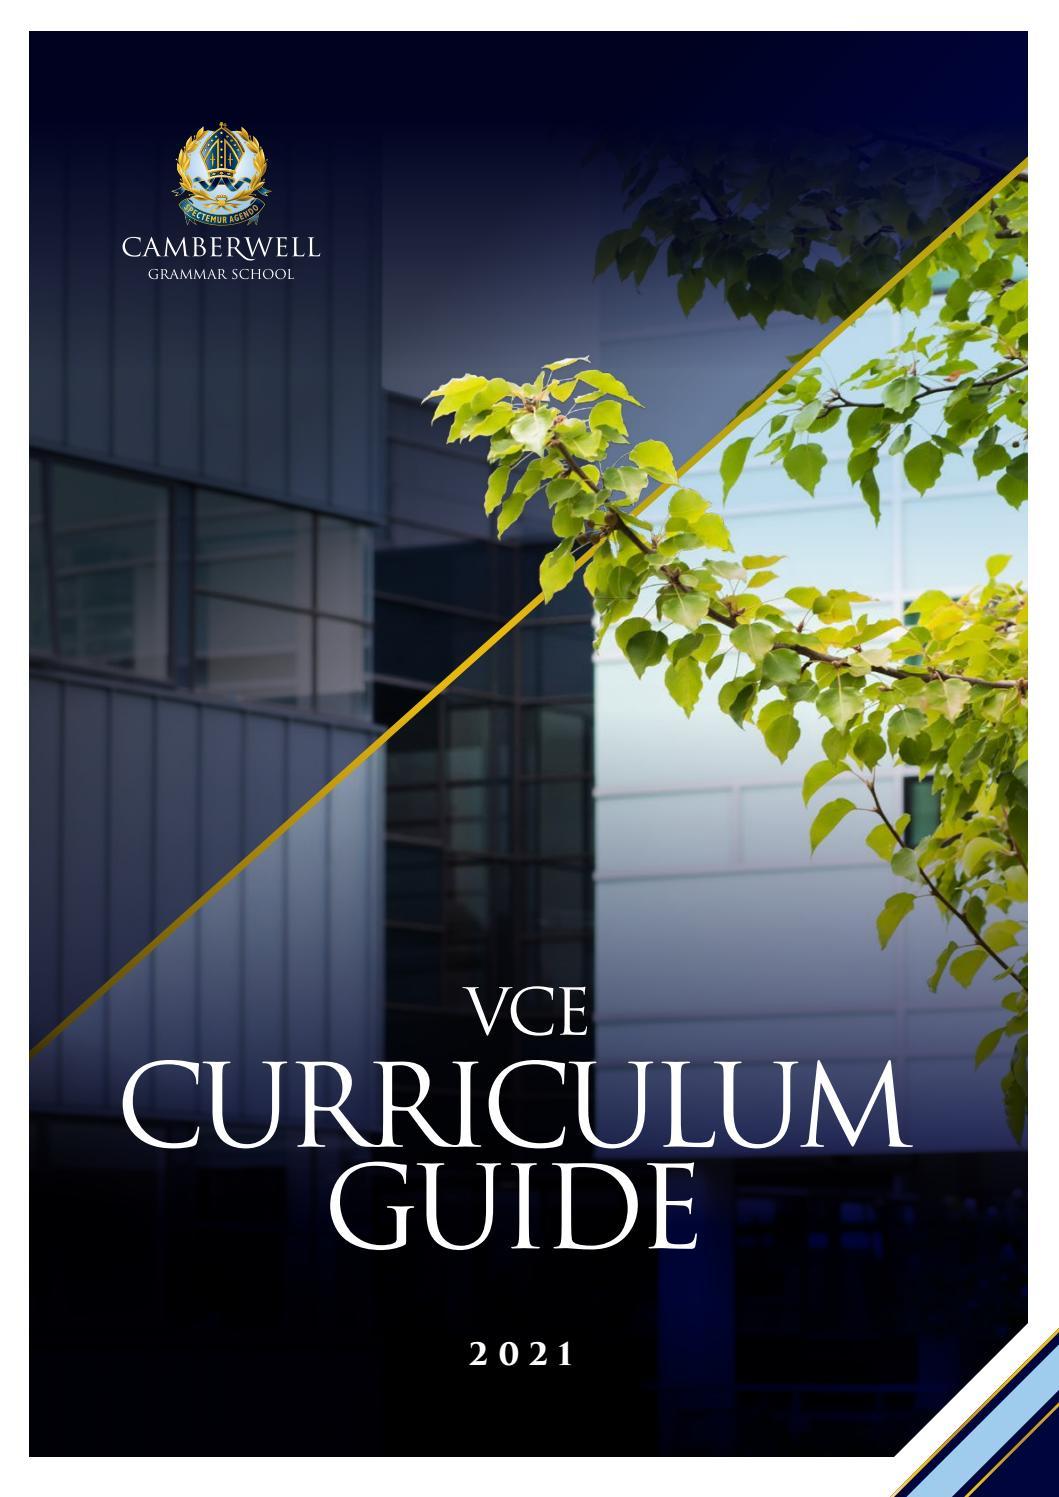 Vce Curriculum Guide 2021 By Camberwell Grammar School Issuu